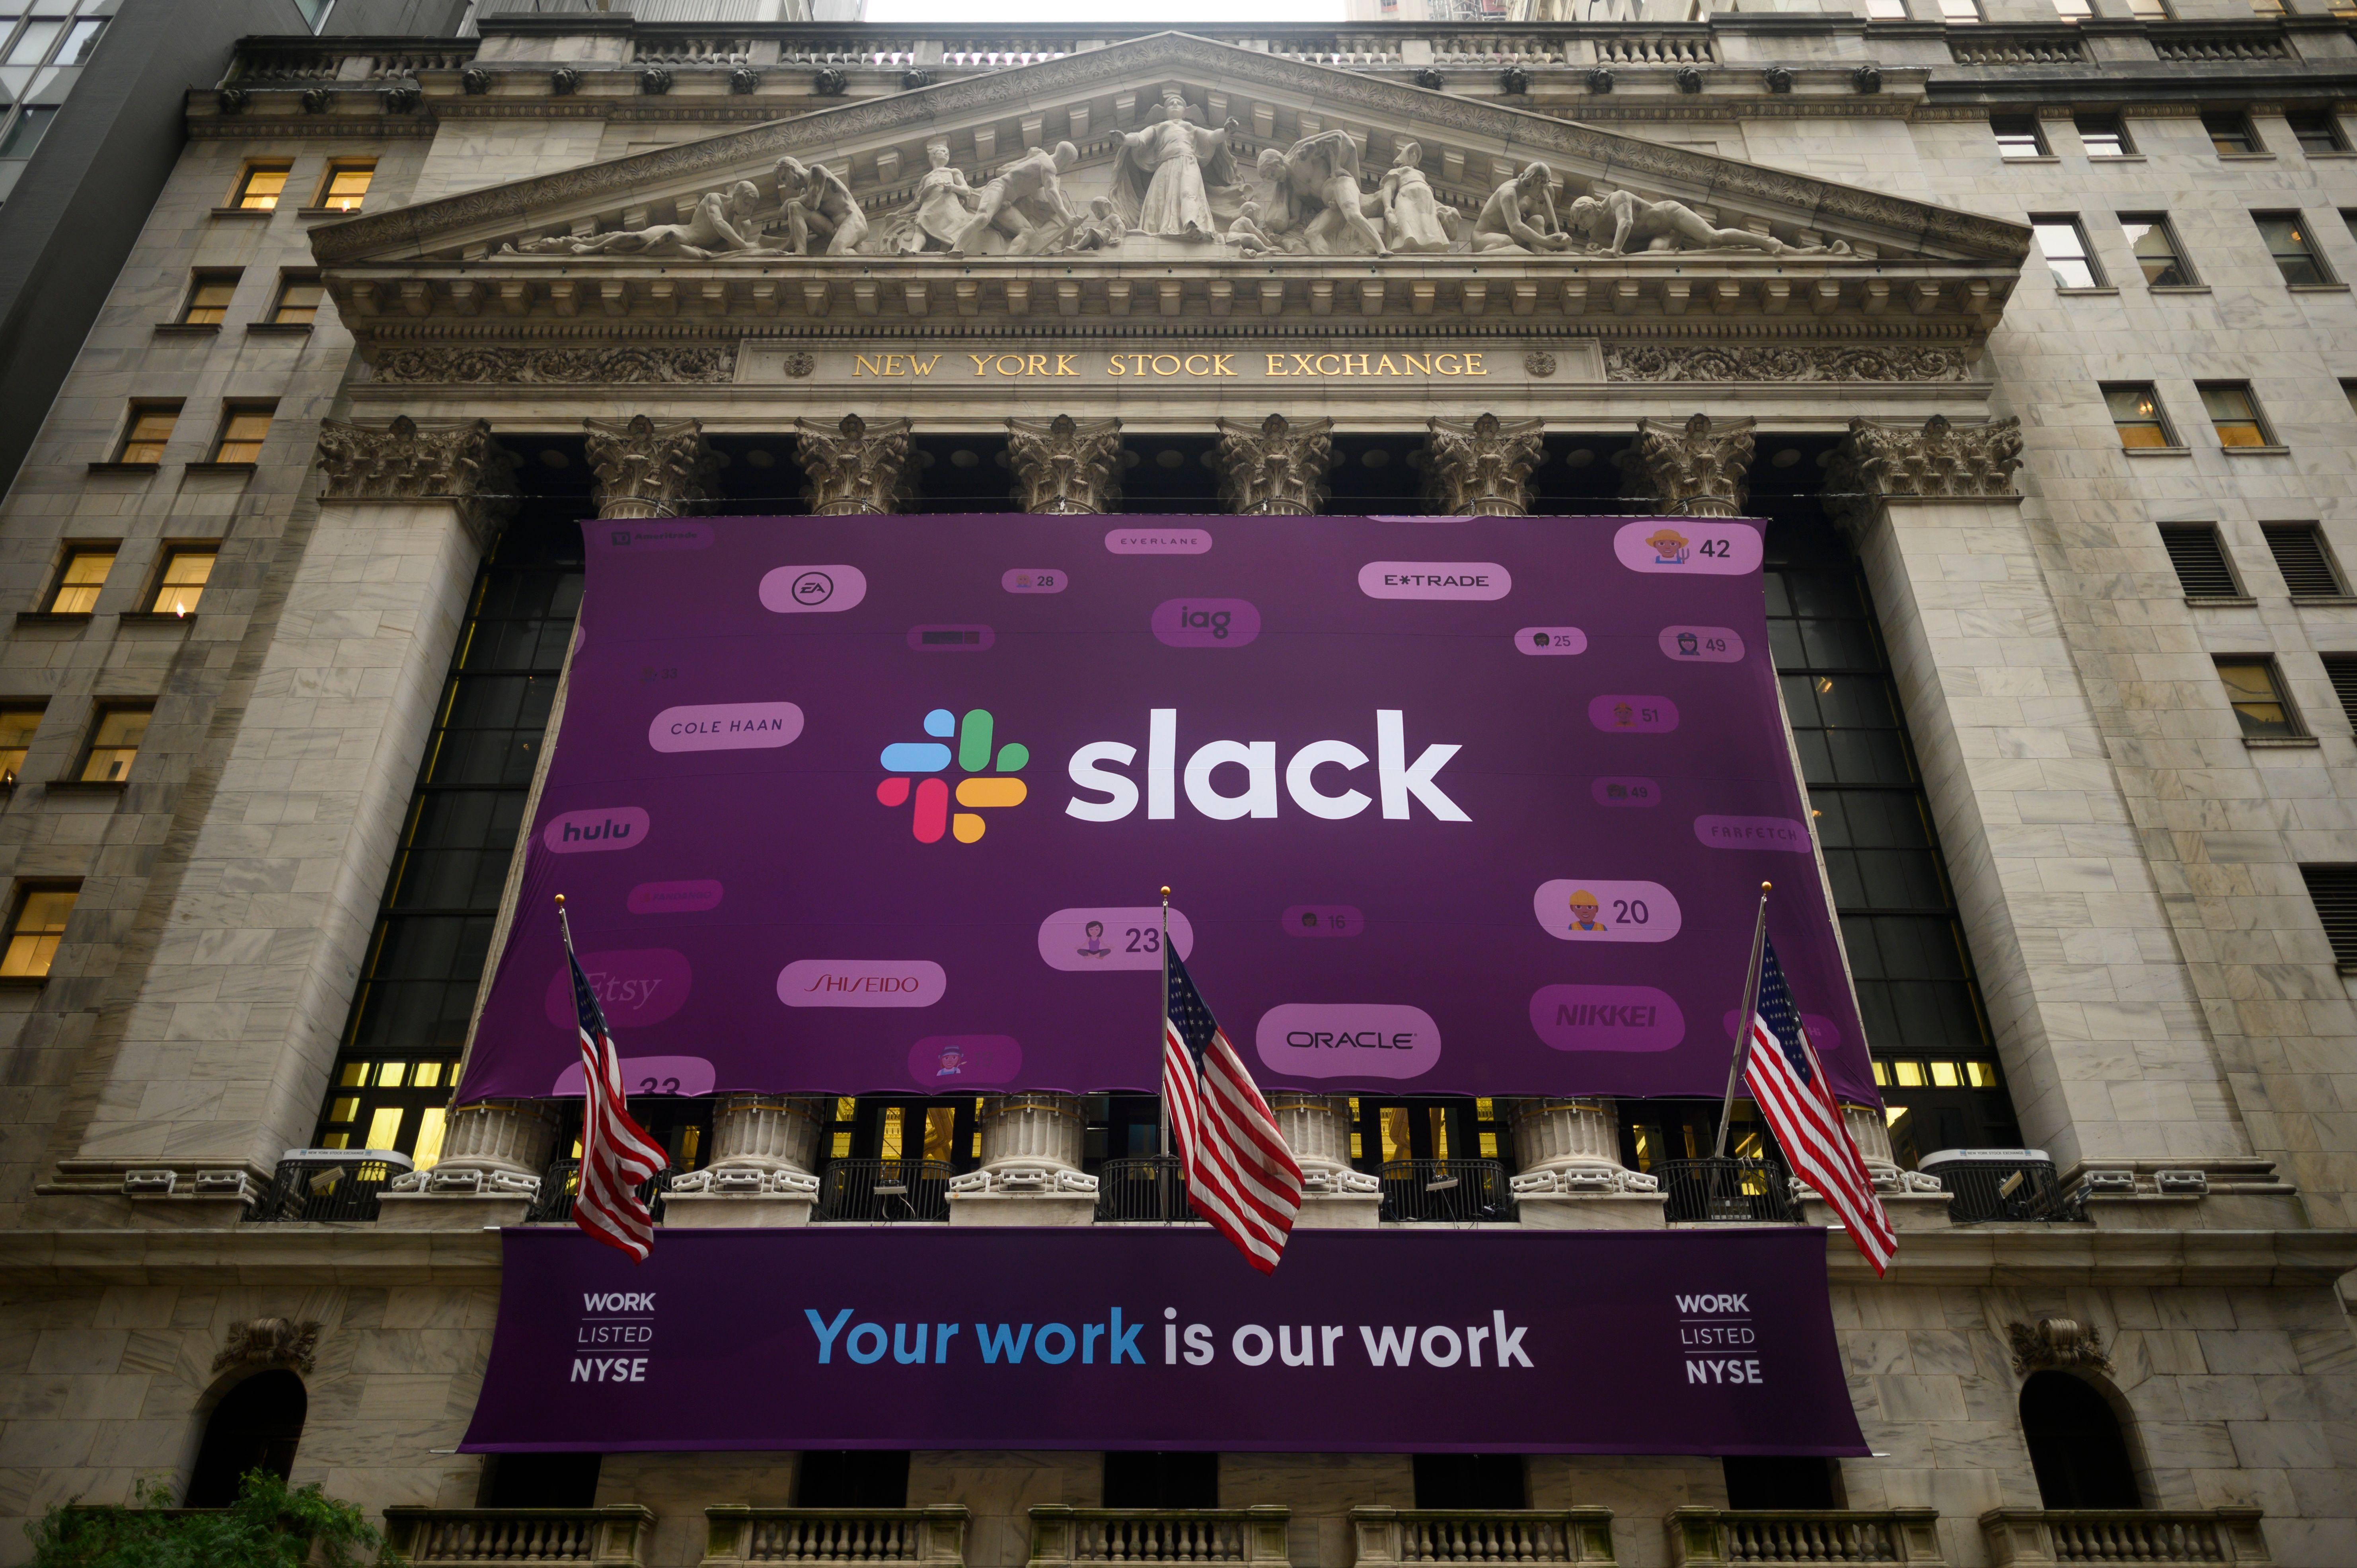 Slack banner hanging outside the New York Stock Exchange building.